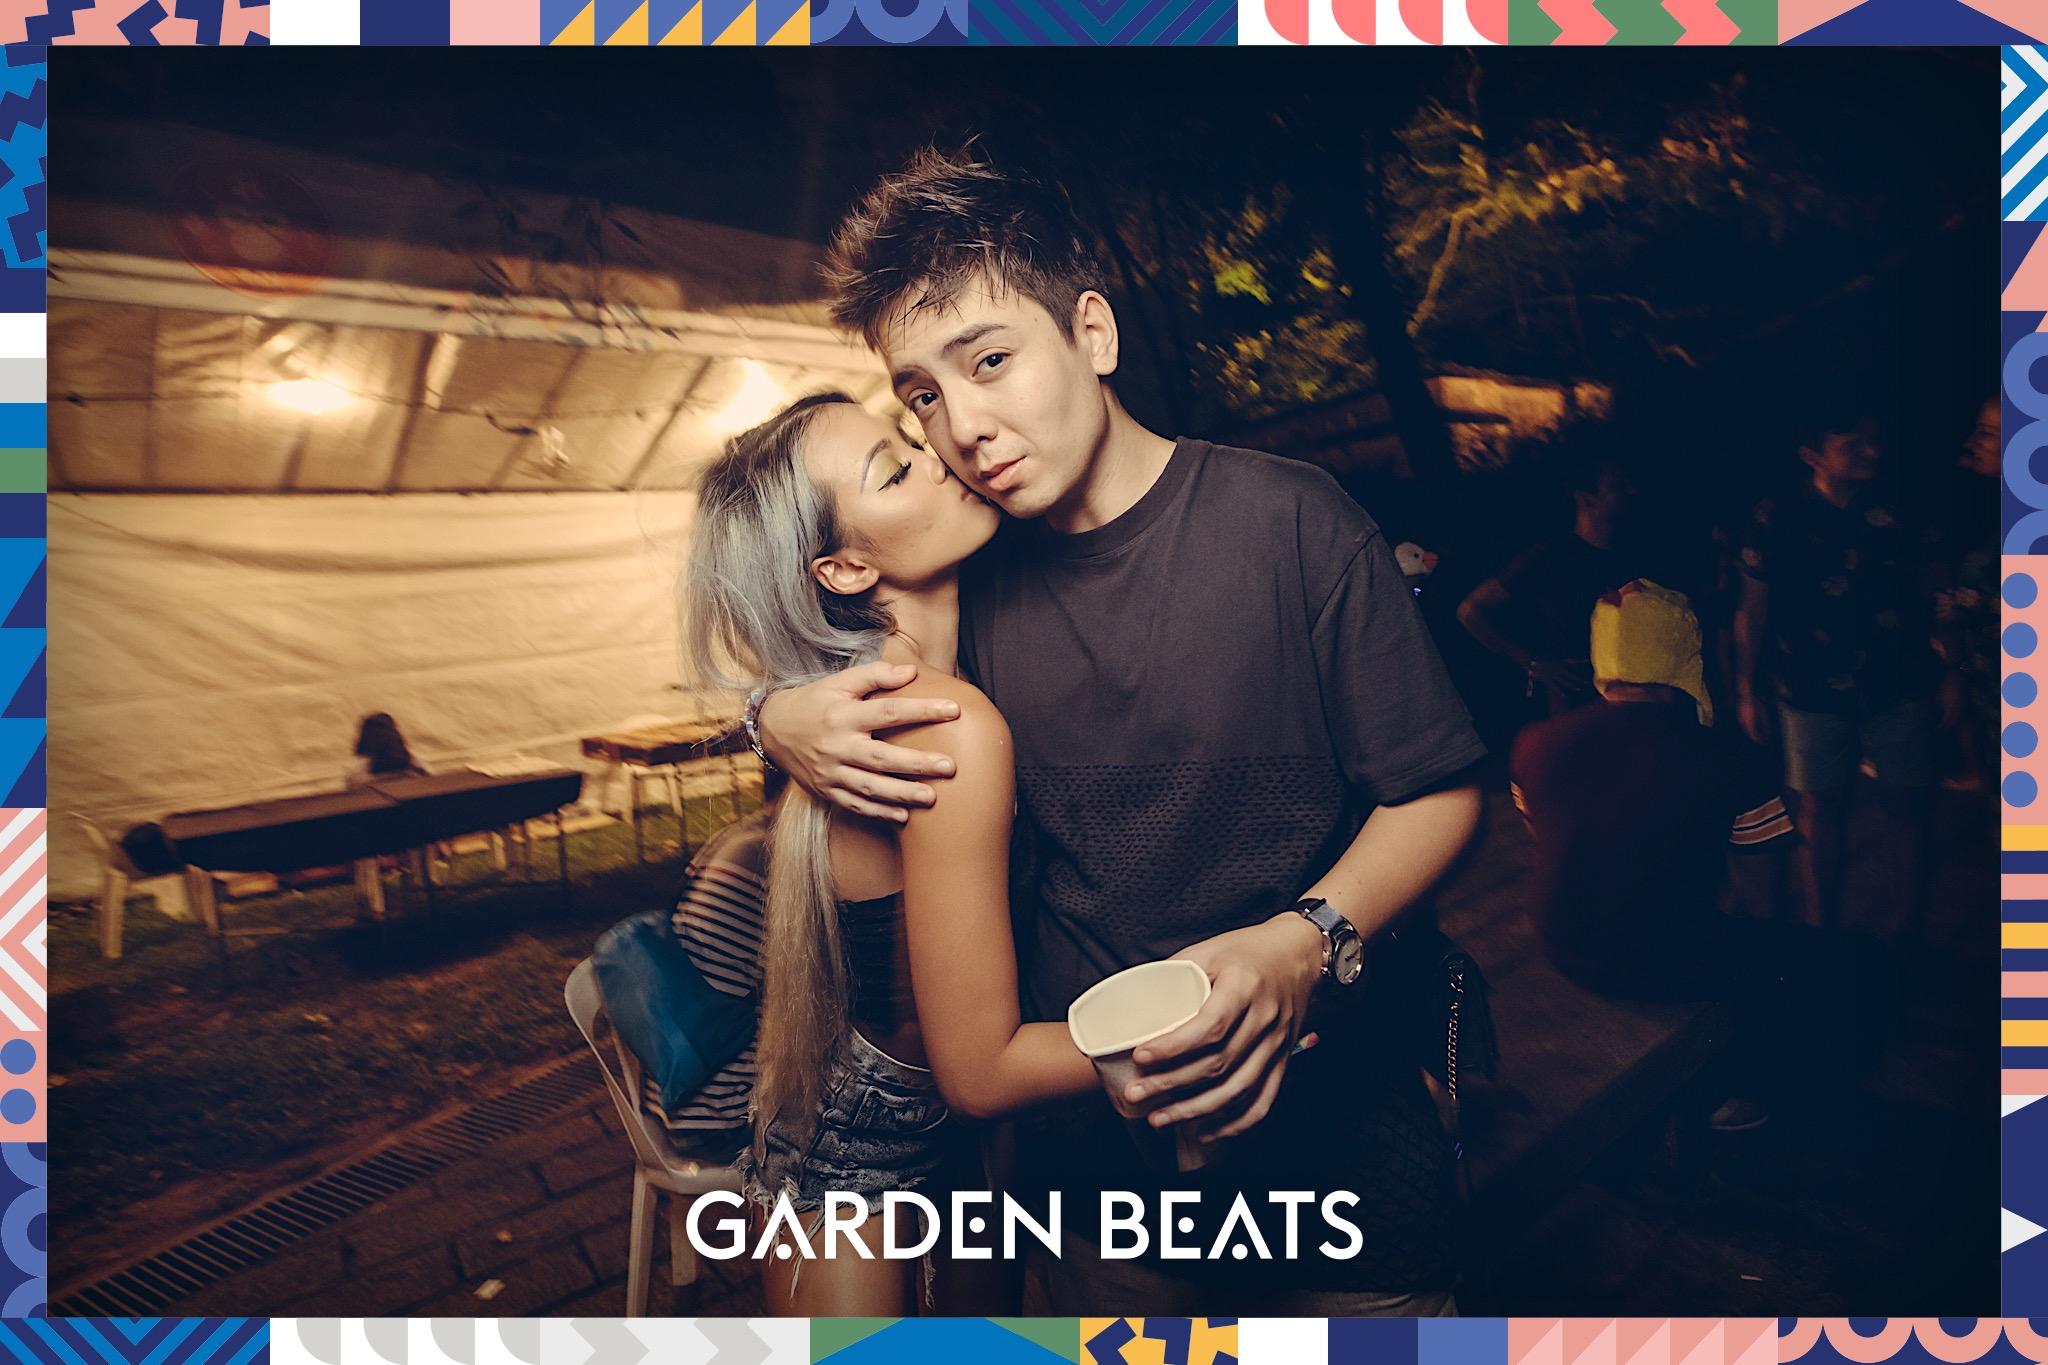 03032018_GardenBeats_Colossal943_Watermarked.jpg